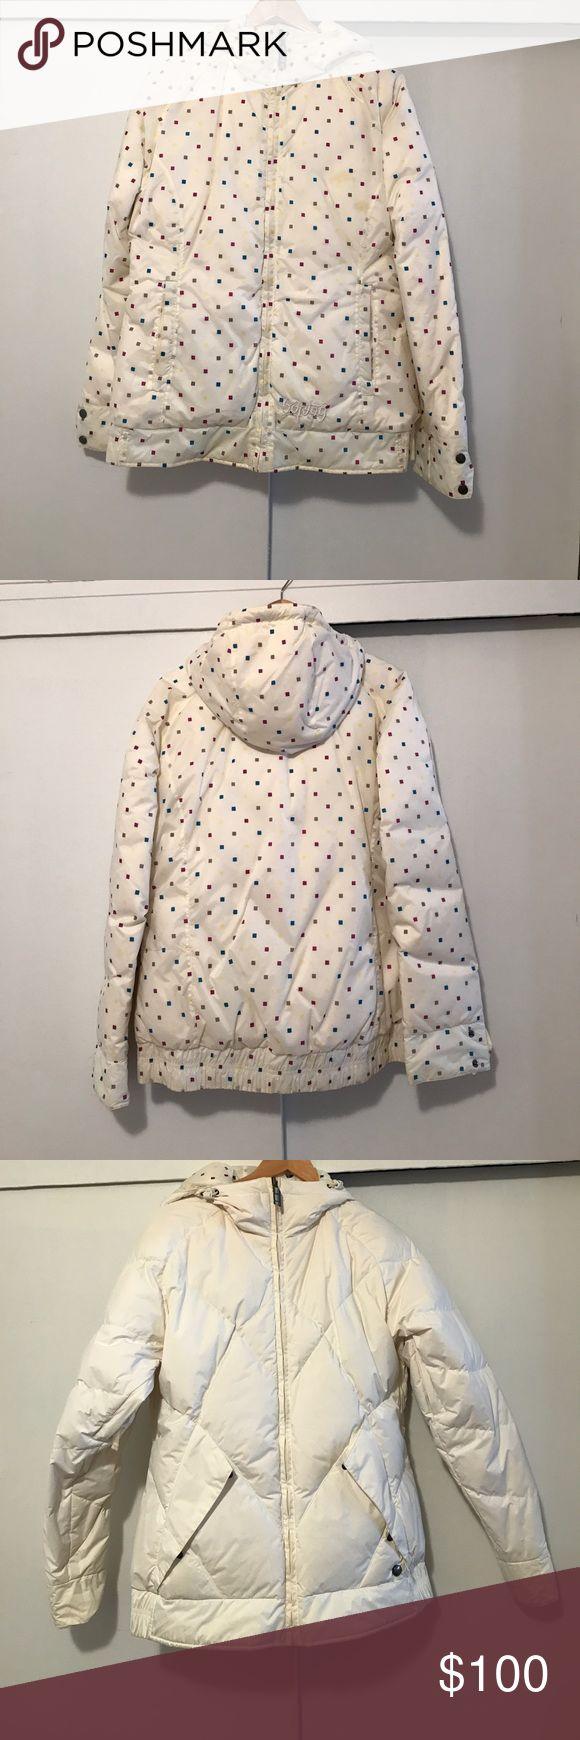 Burton ski jacket Burton two sides ski jacket. Light, warm, comfortable. Pockets on both sides. Worn once. If you buy it together with Columbia snowboard/ ski pants, you will get additional $20 off Burton Jackets & Coats